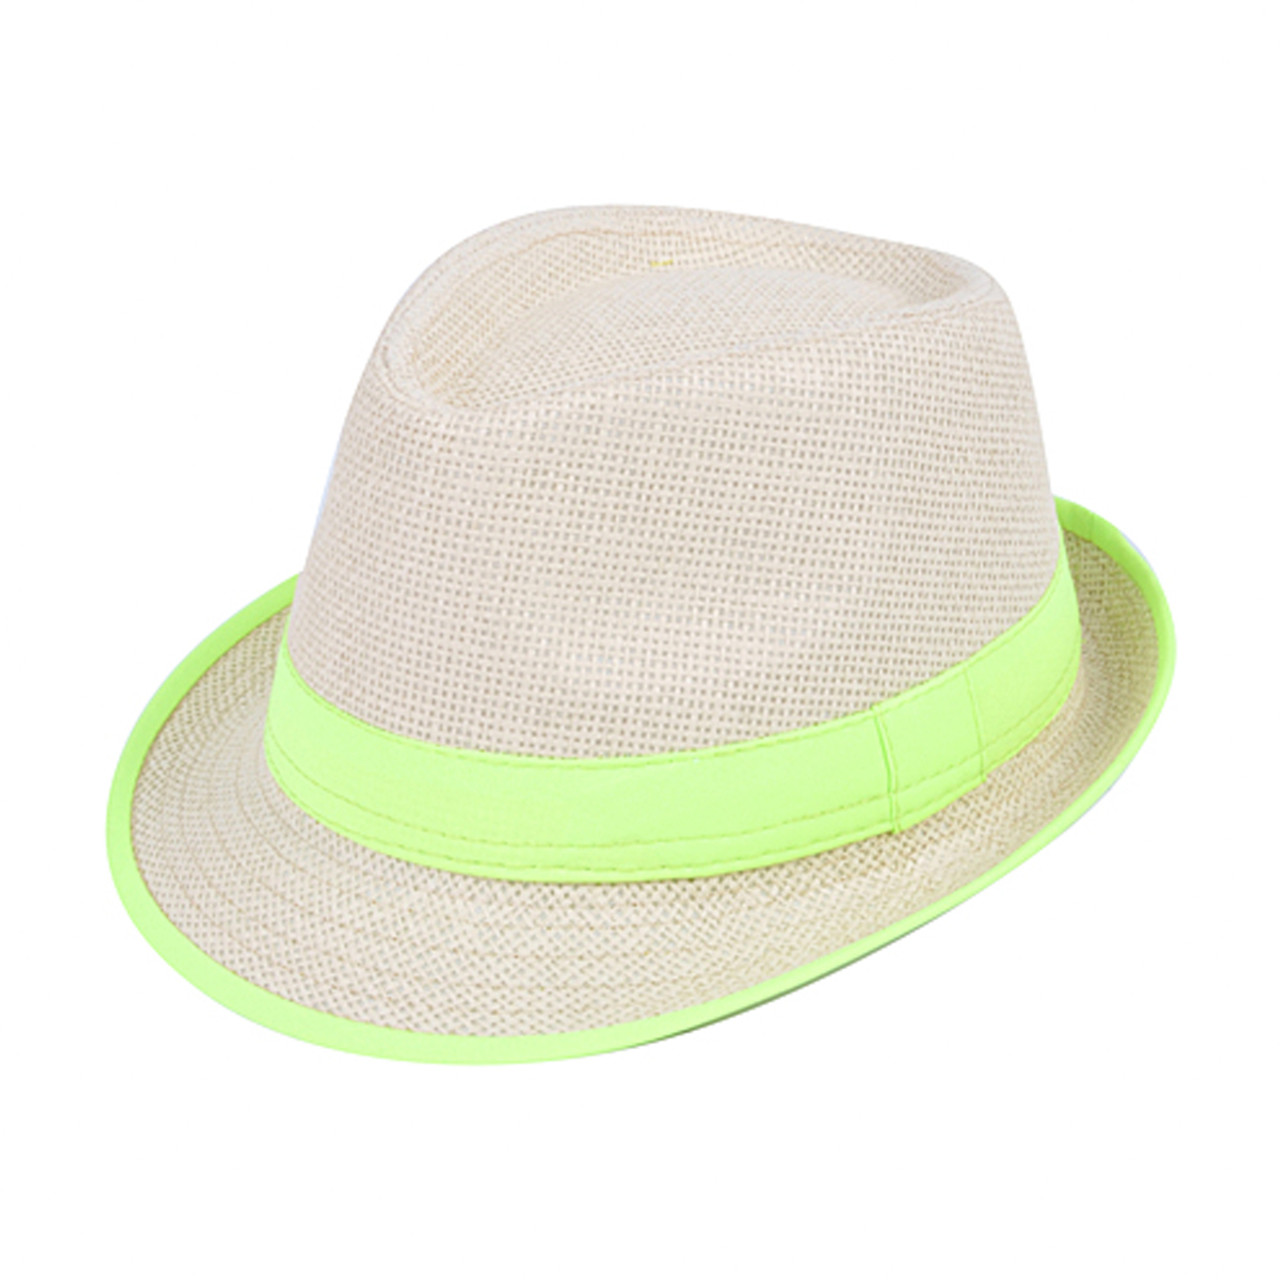 ... 120pc Mixed Unisex Neon Fedora Hats HNEON-CO ... d73afdb6e001